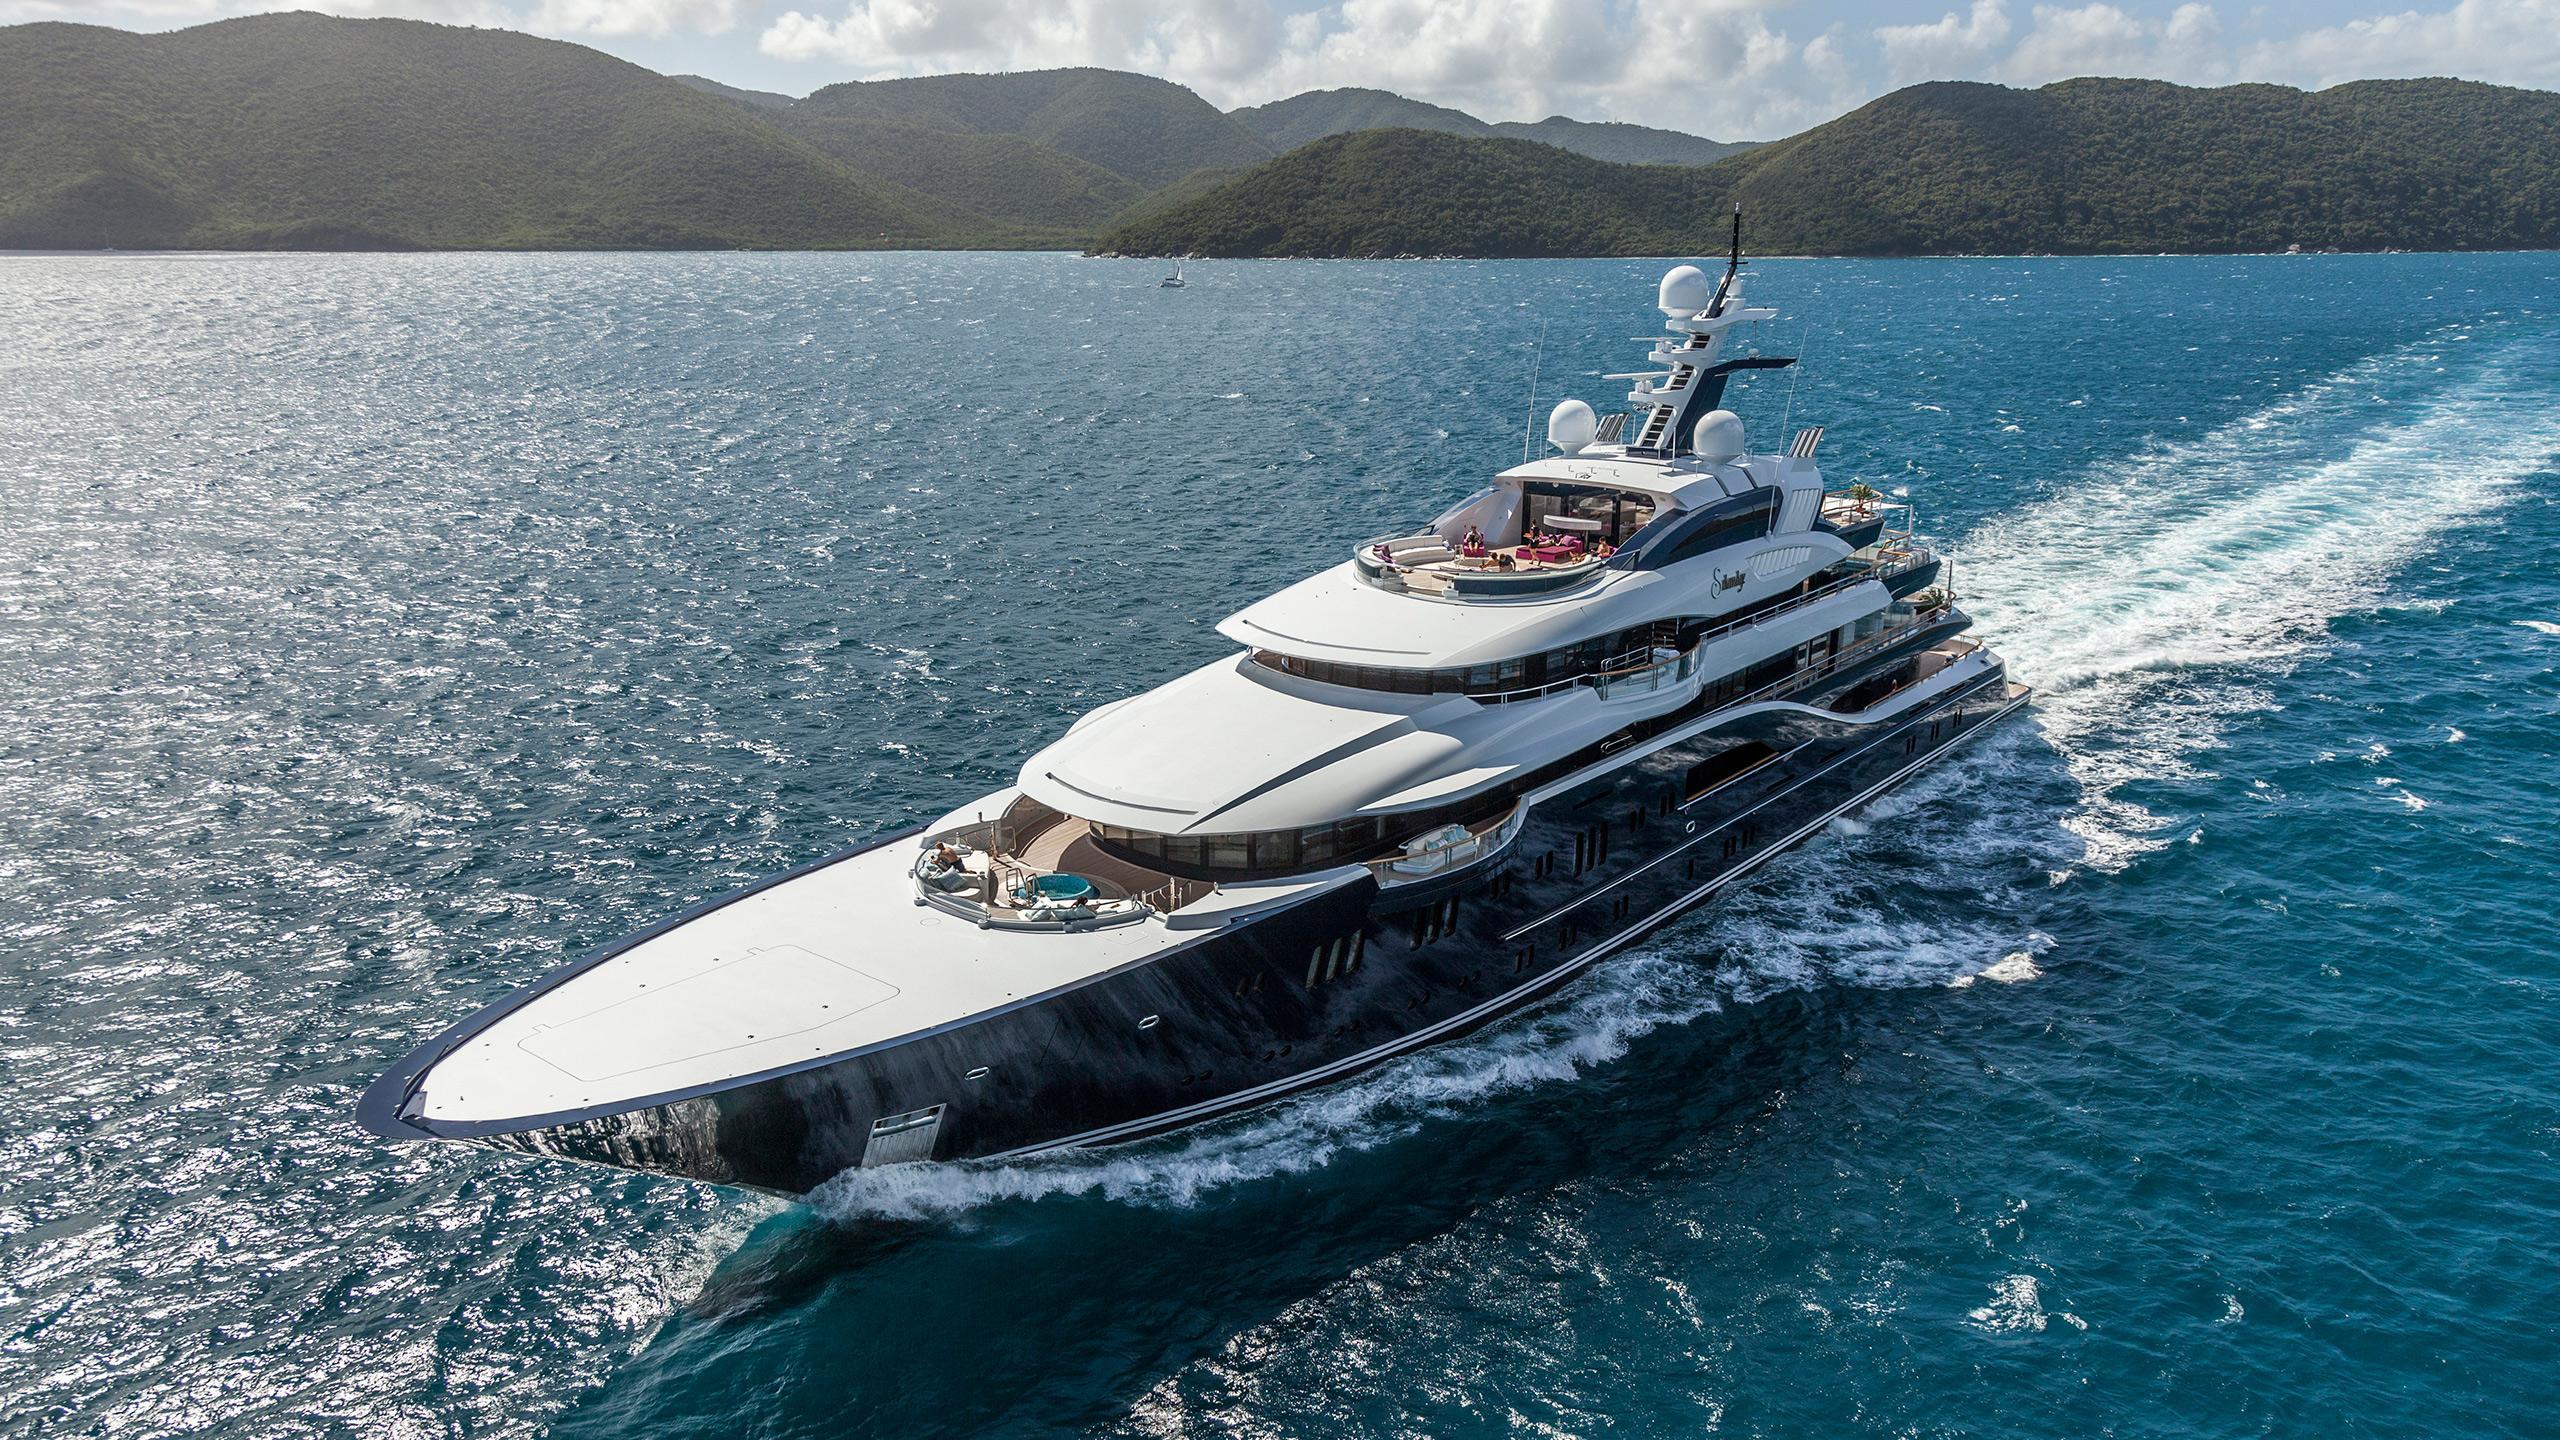 solandge-motor-yacht-lurssen-2013-85m-half-profile-cruising